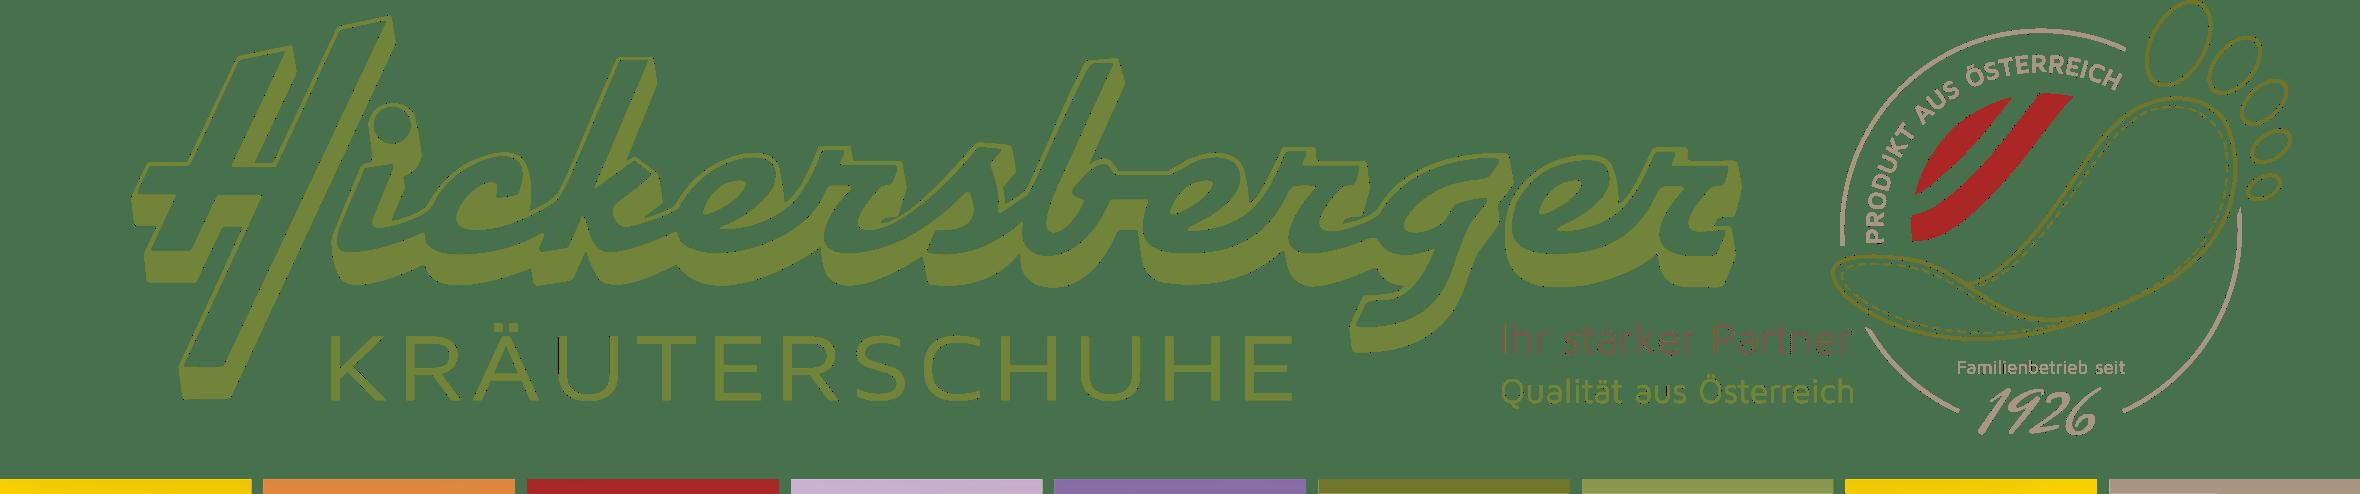 Schuhfabrik A. Hickersberger GmbH & Co KG